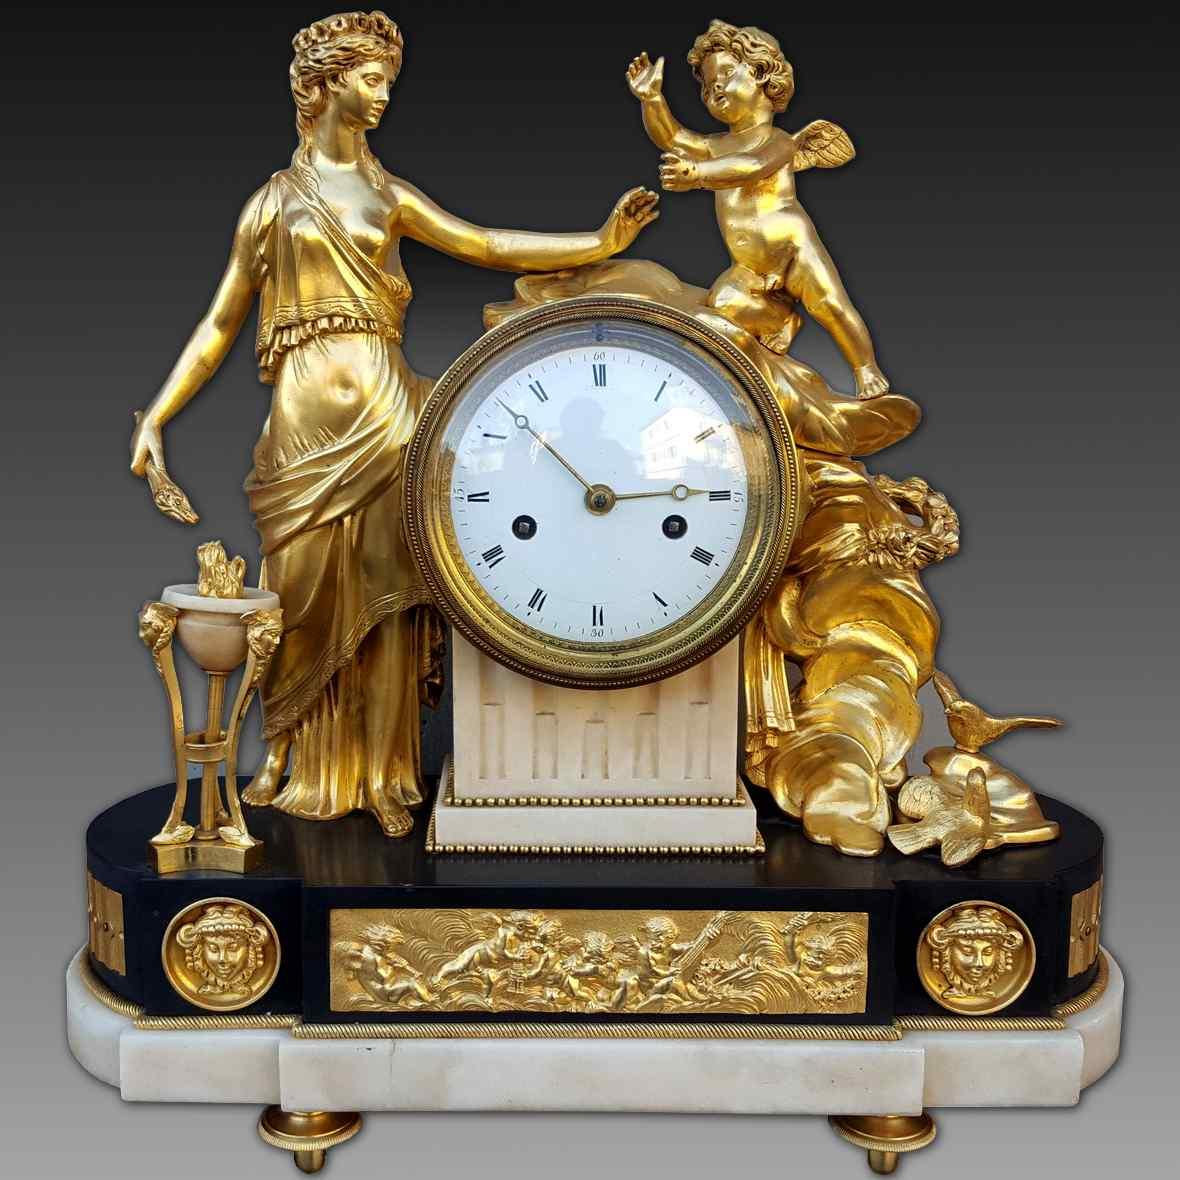 Ancien Horloge Pendule Louis XVI en bronze - 18ème siècle